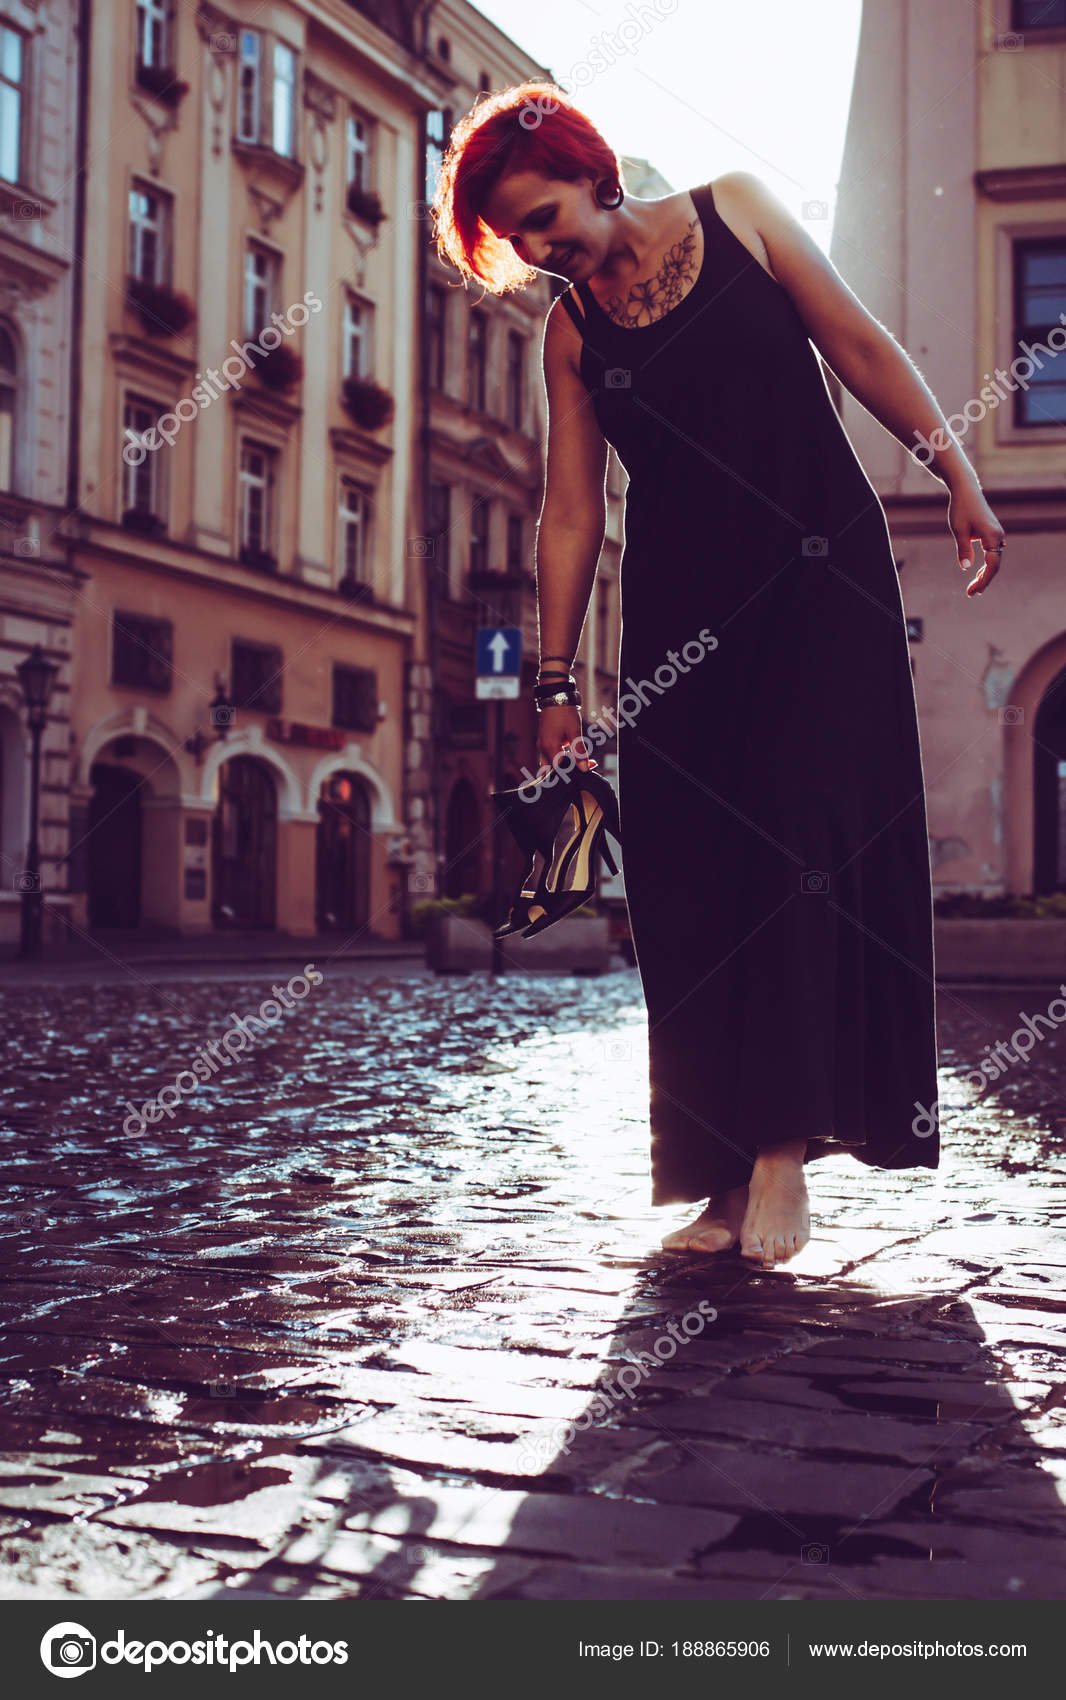 https://st3.depositphotos.com/1001194/18886/i/1600/depositphotos_188865906-stock-photo-red-hair-young-woman-walking.jpg